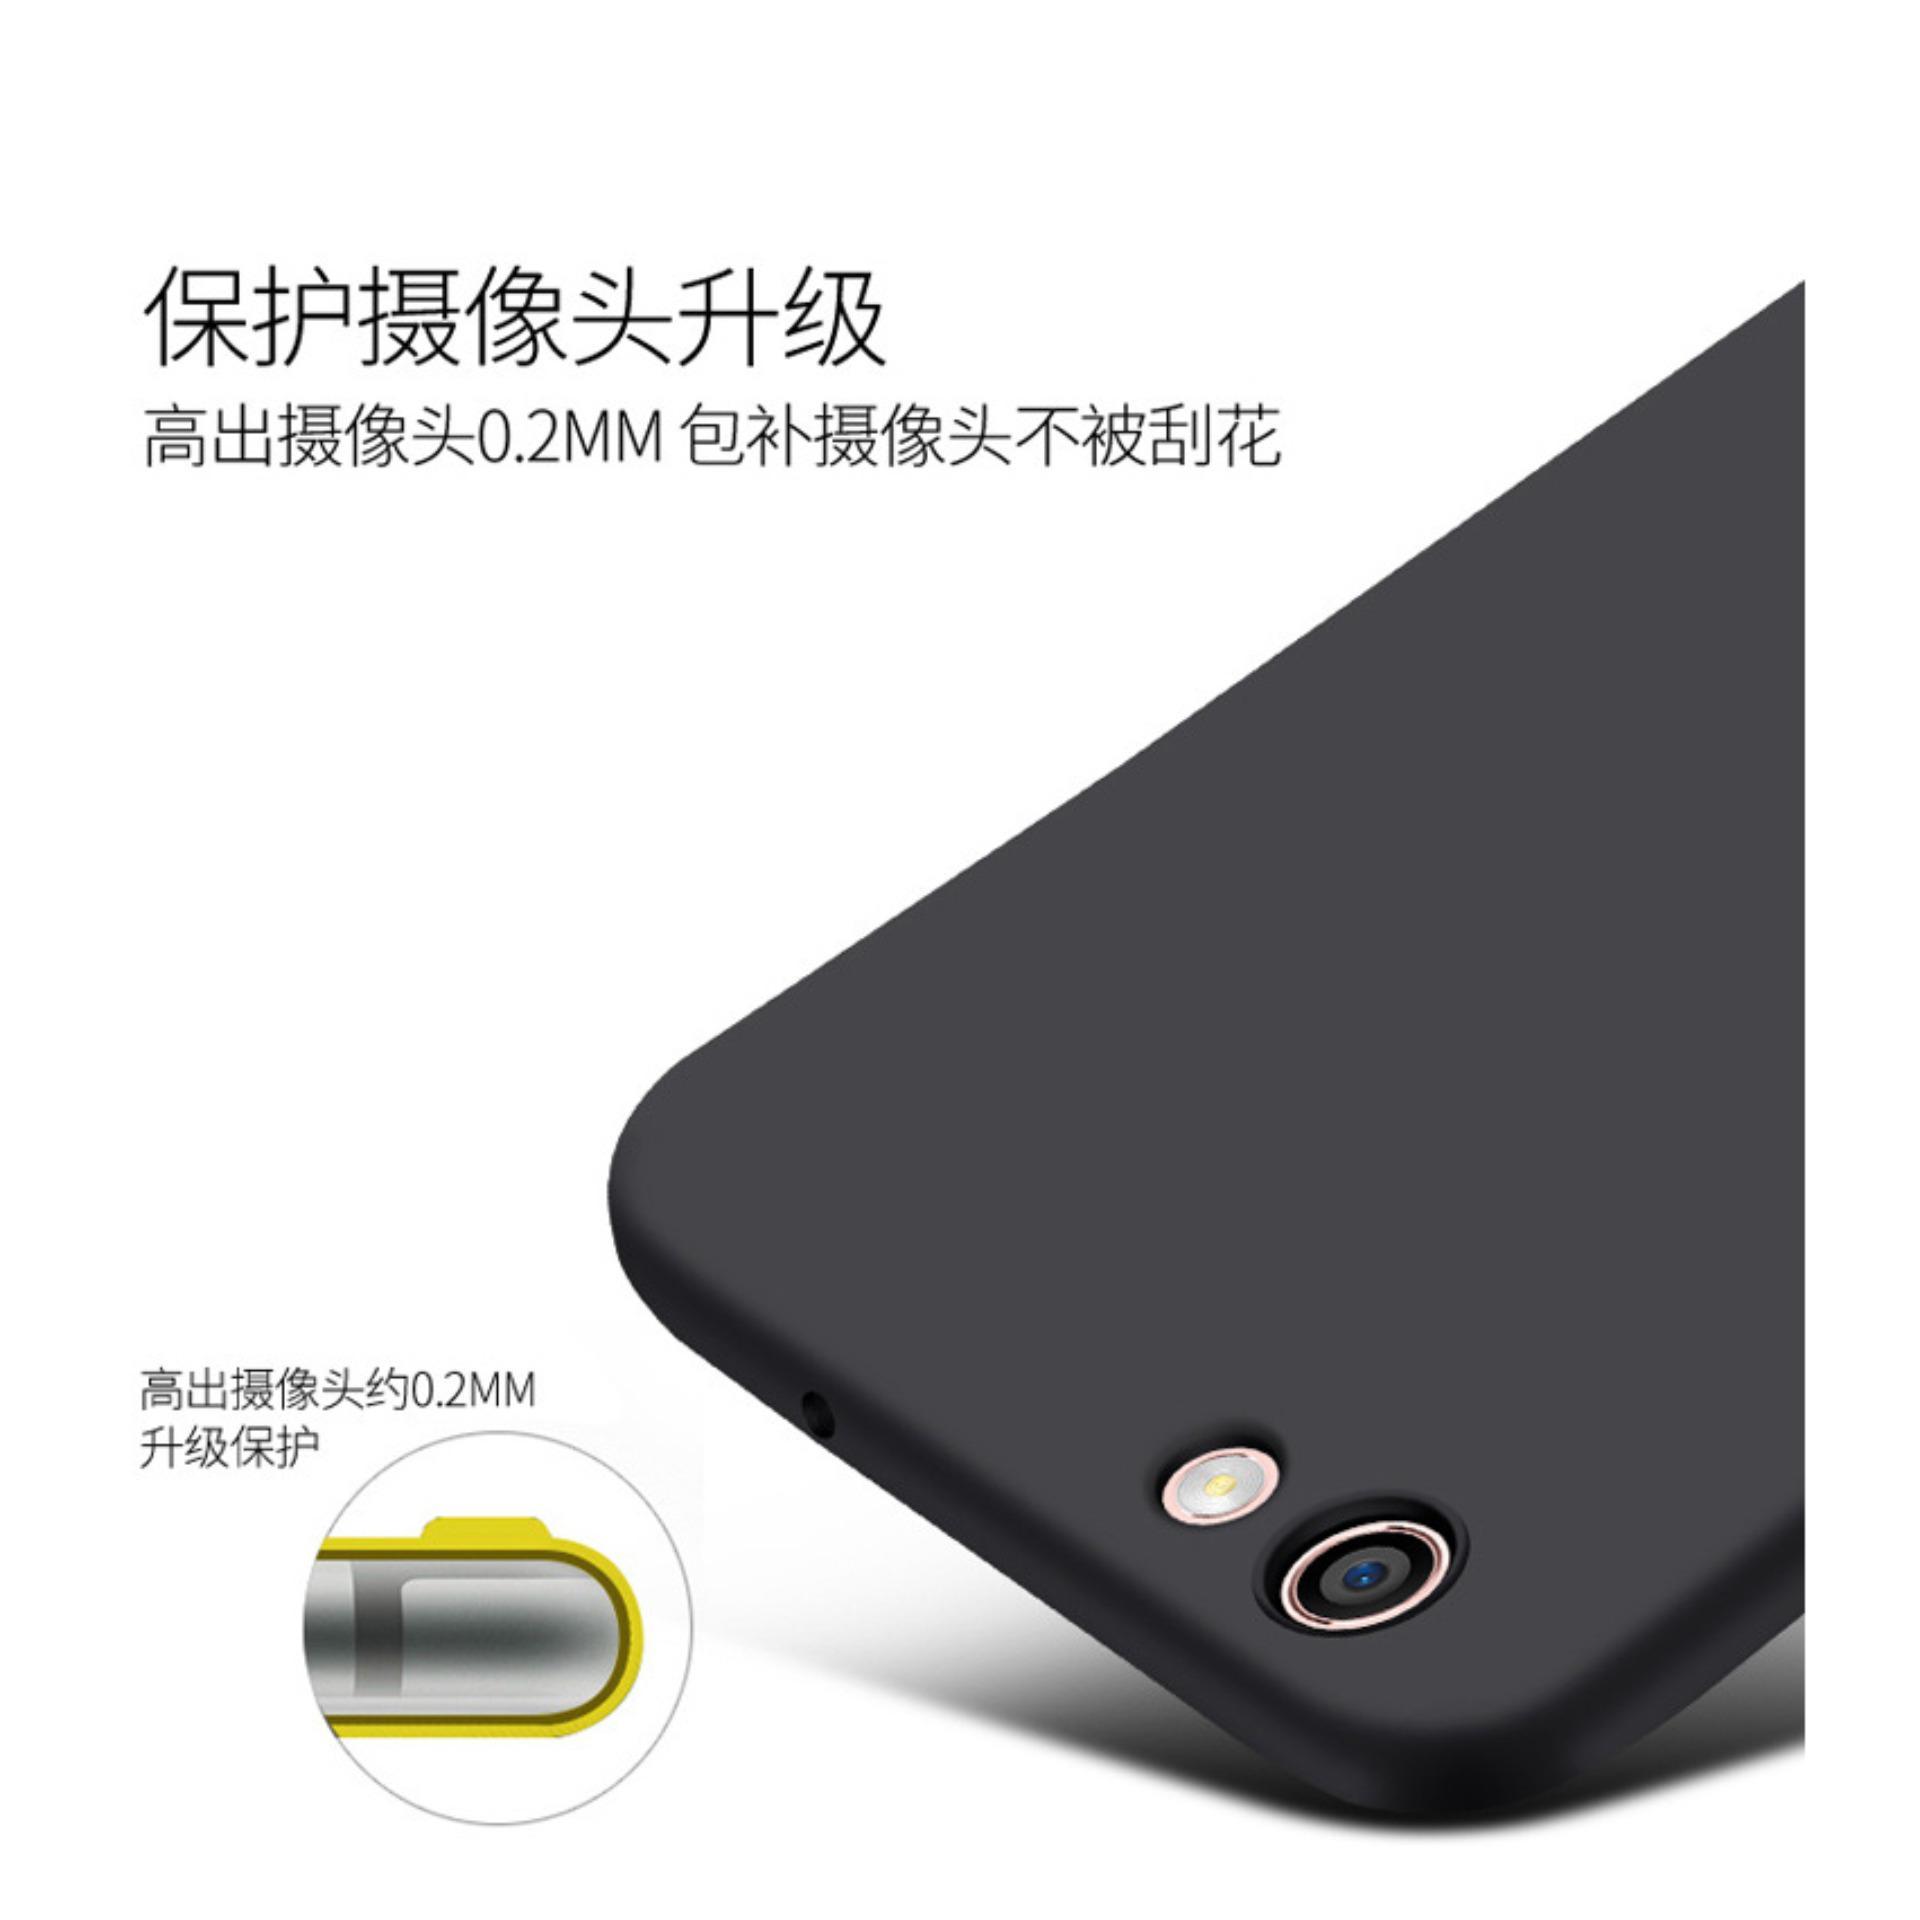 jelly doff slim silicone oppo f3 ultra thin case casing cover .